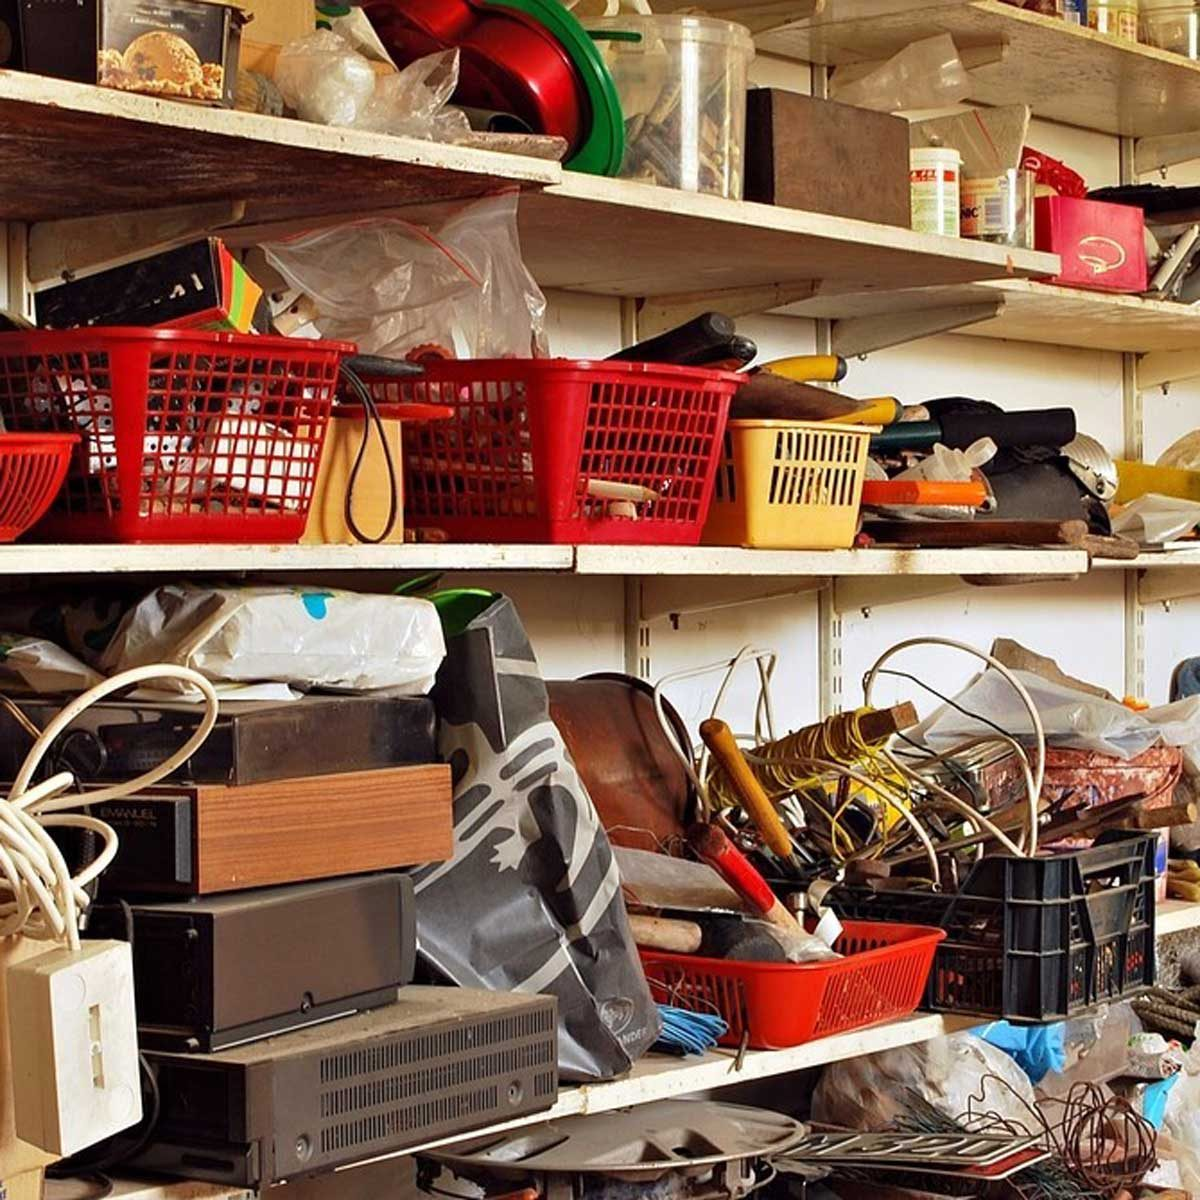 dfh17jul034_693249247_13 clutter storage fail messy junk garage sale time